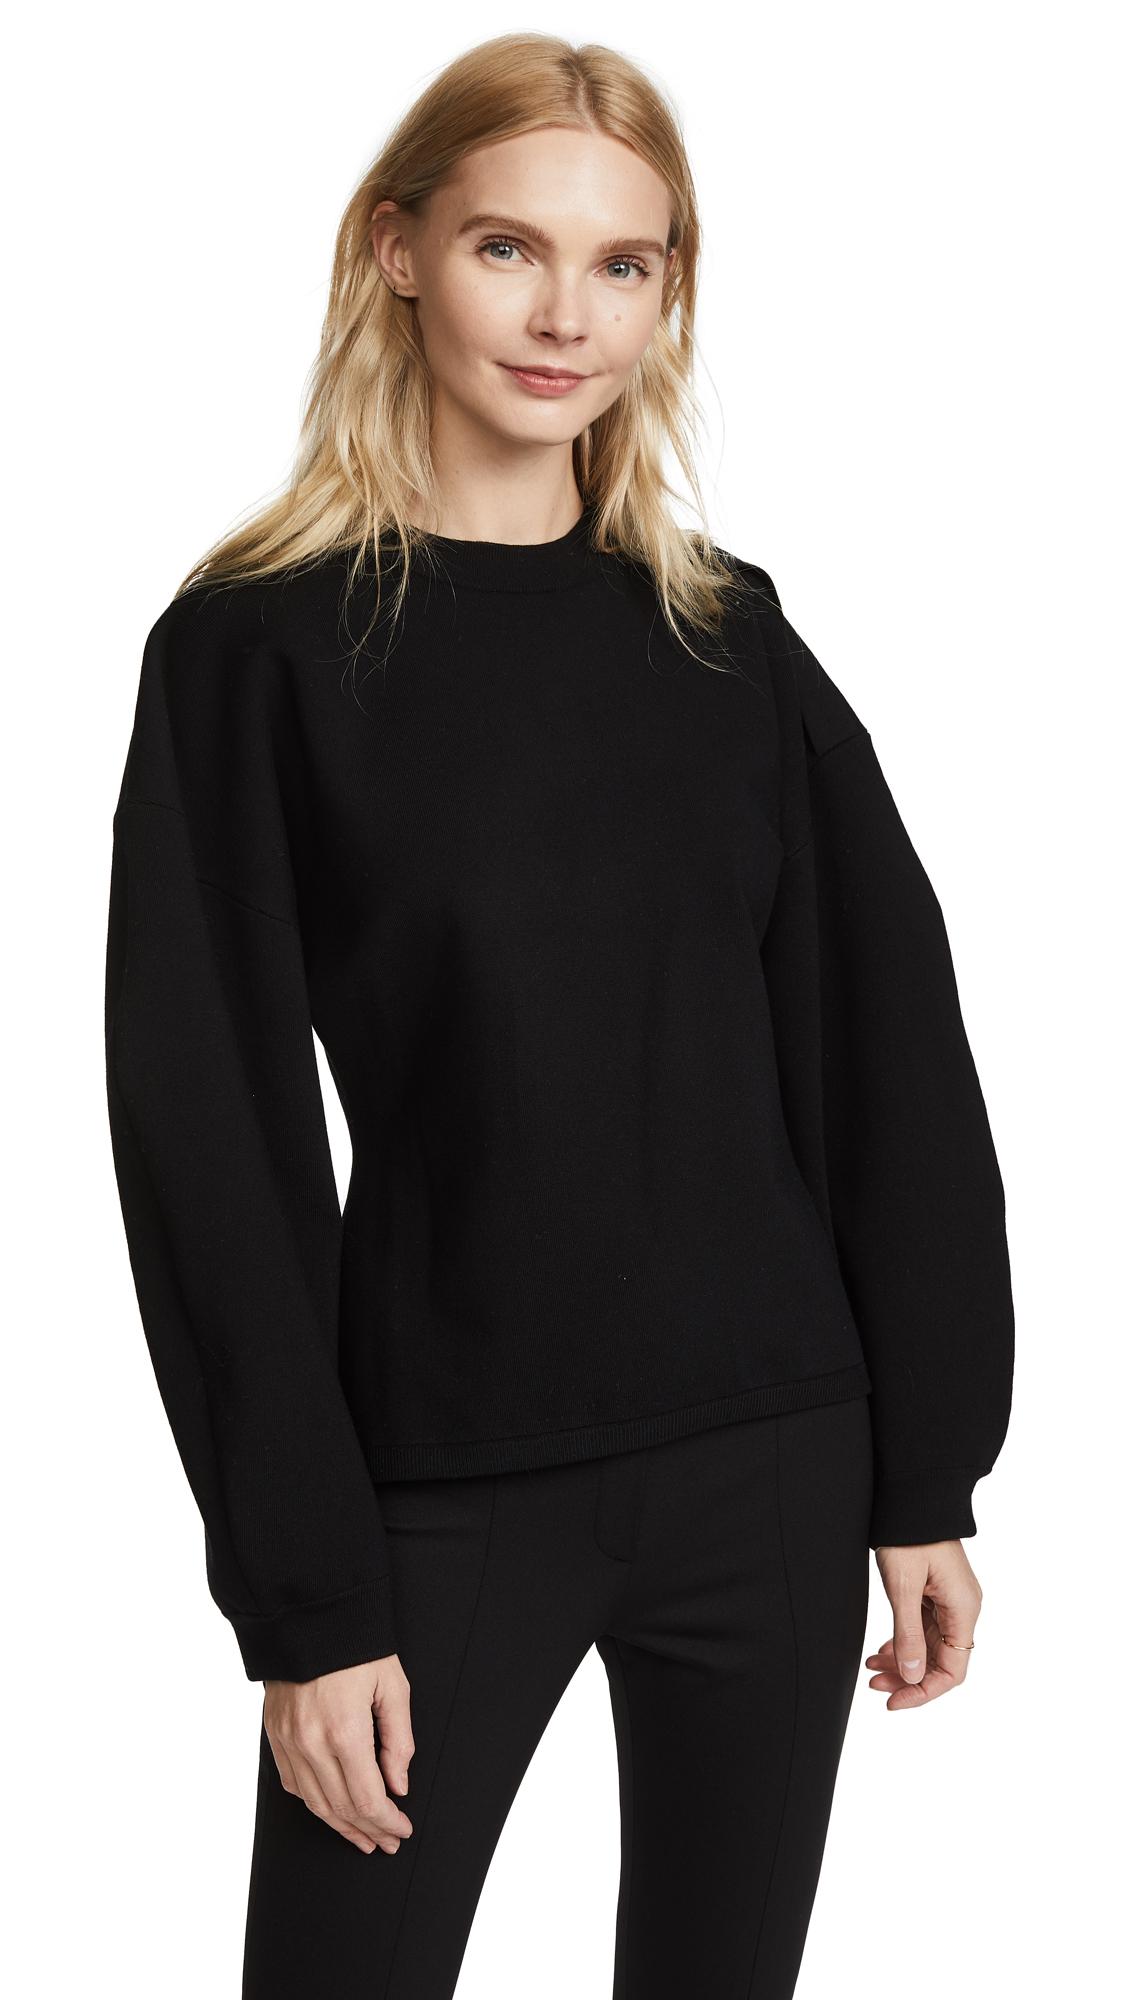 Tibi Sculpted Sleeve Pullover - Black